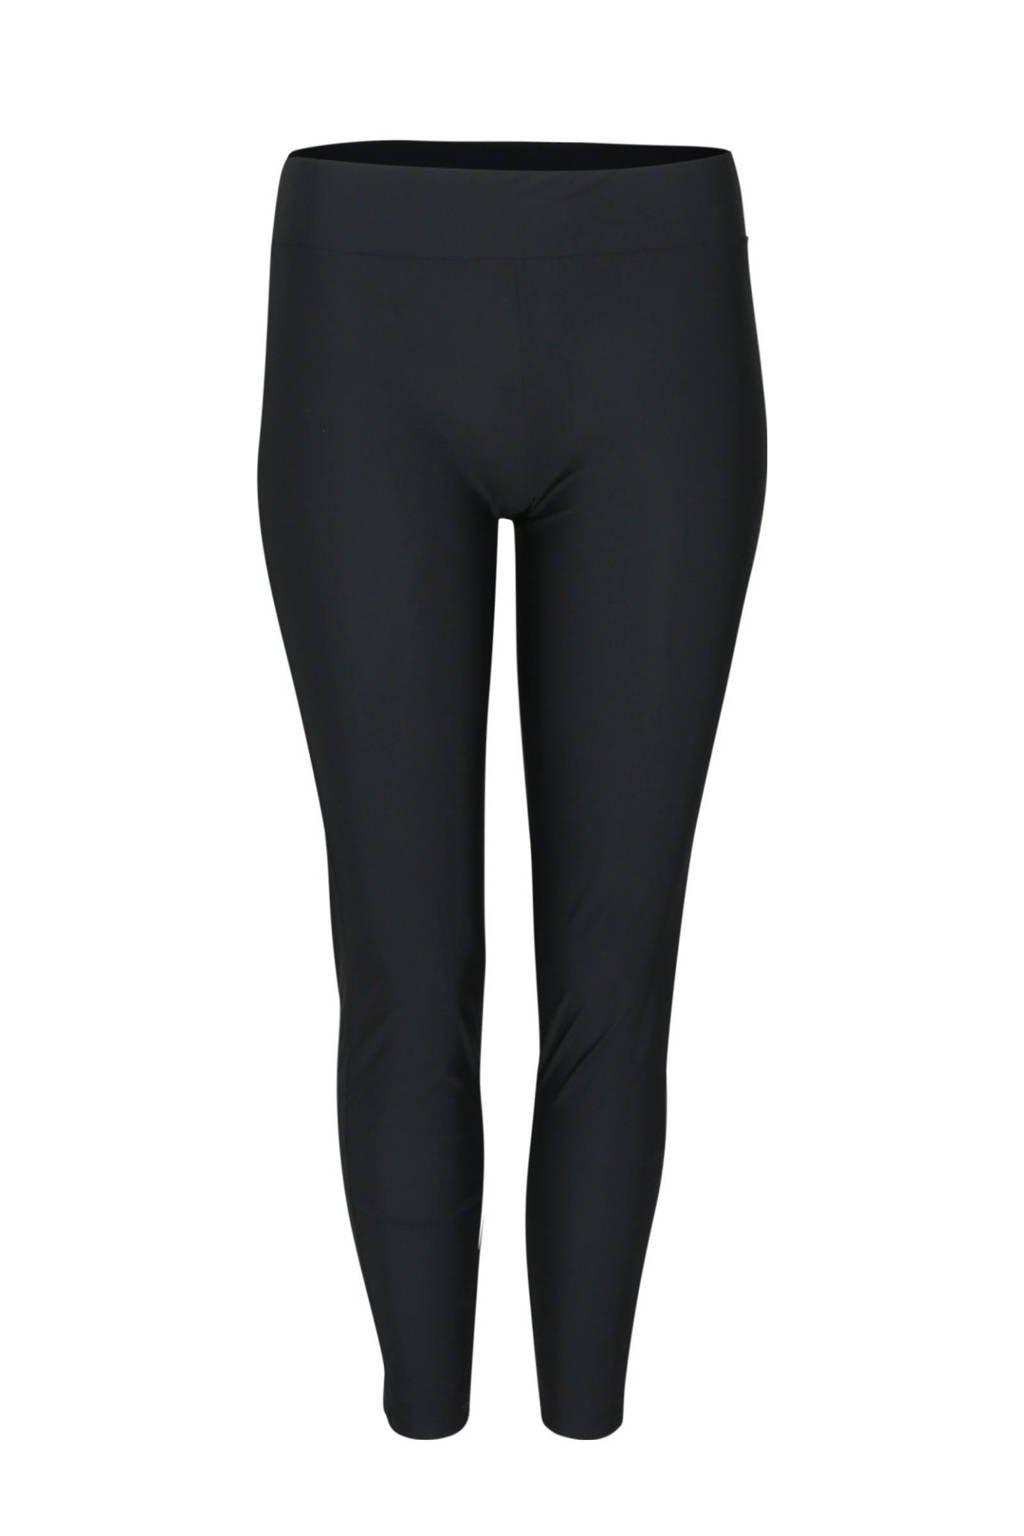 PROMISS Plus Size legging zwart, Zwart